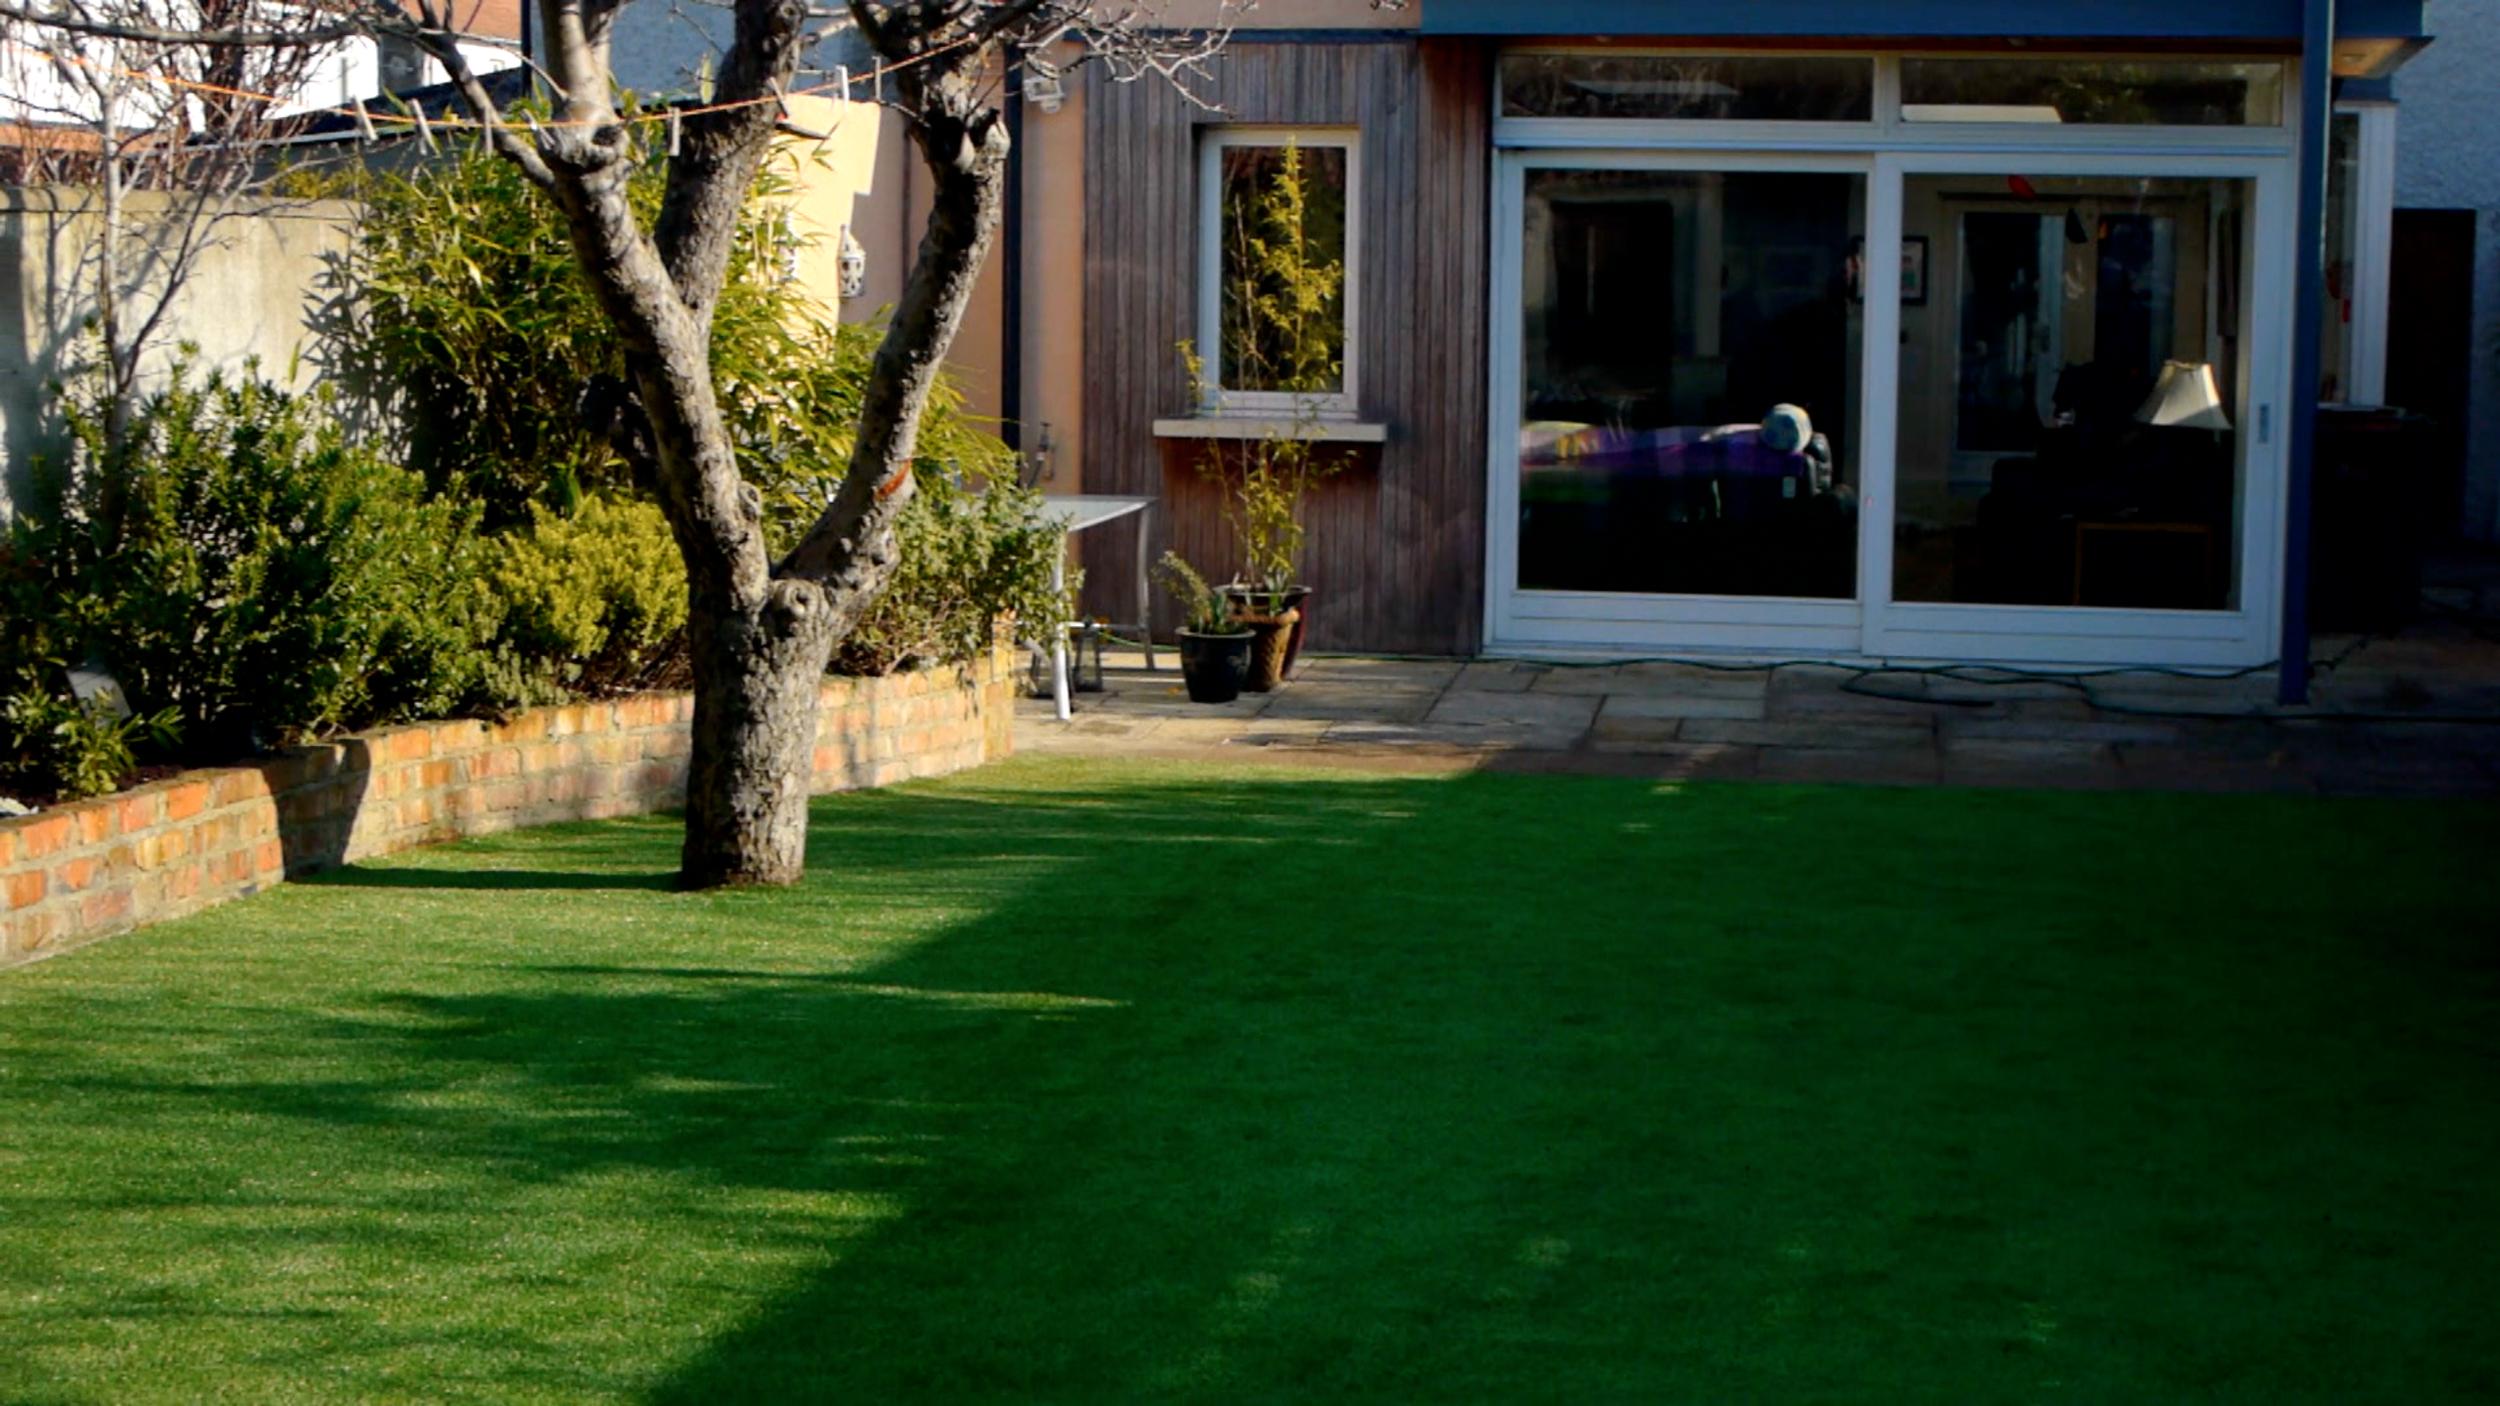 TigerTurf artificial grass lawn